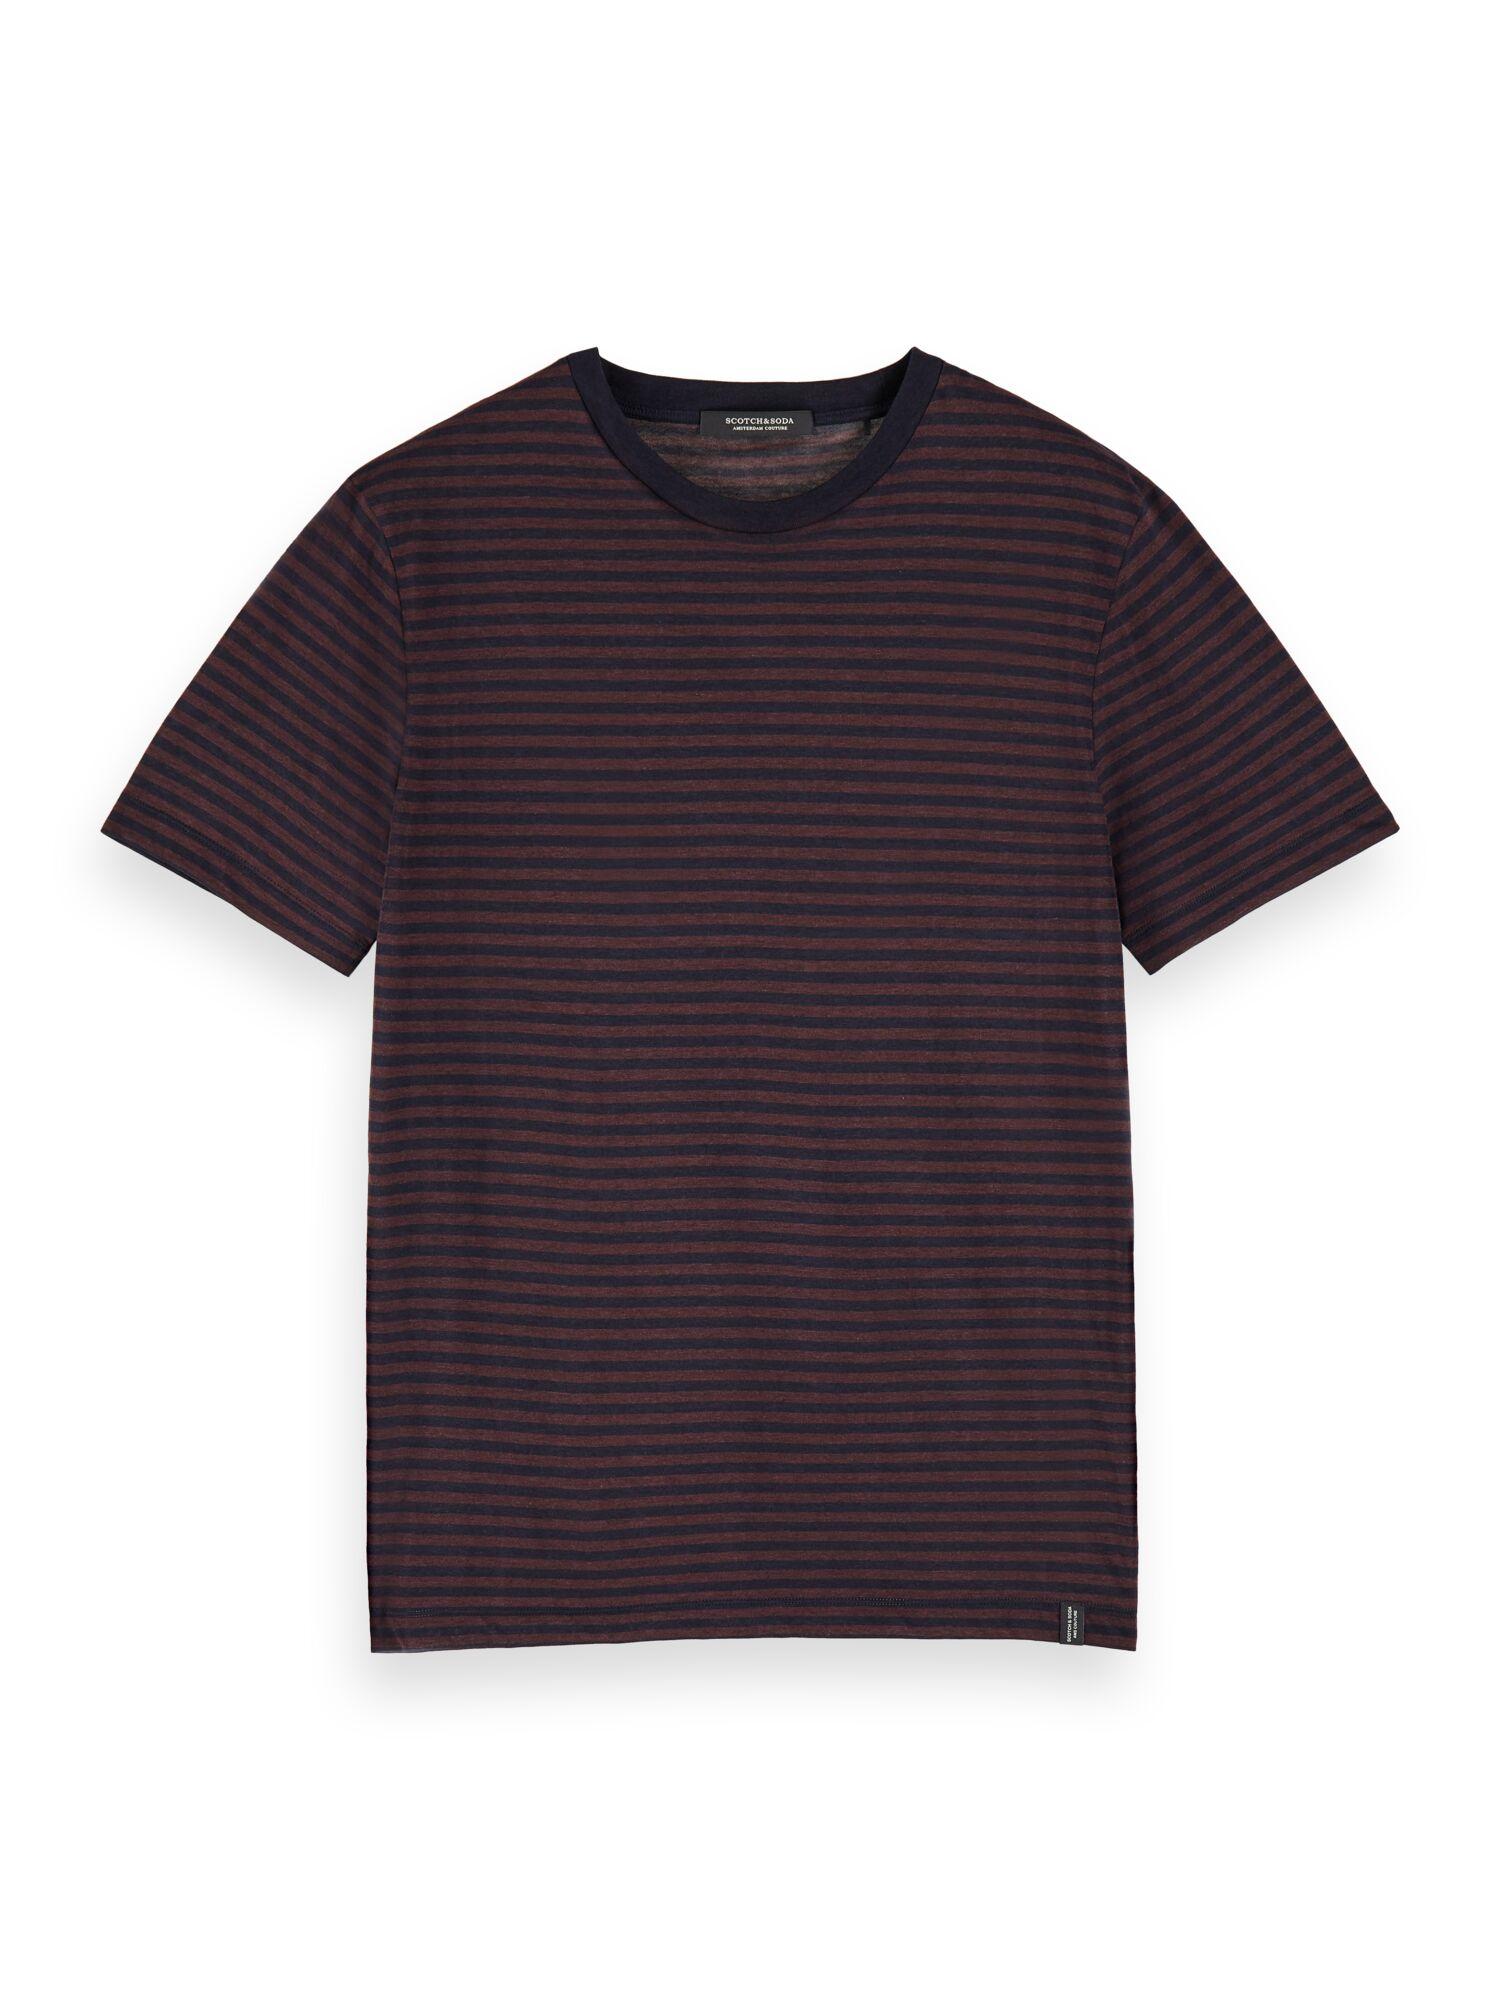 Scotch & Soda   Black Striped T-Shirt